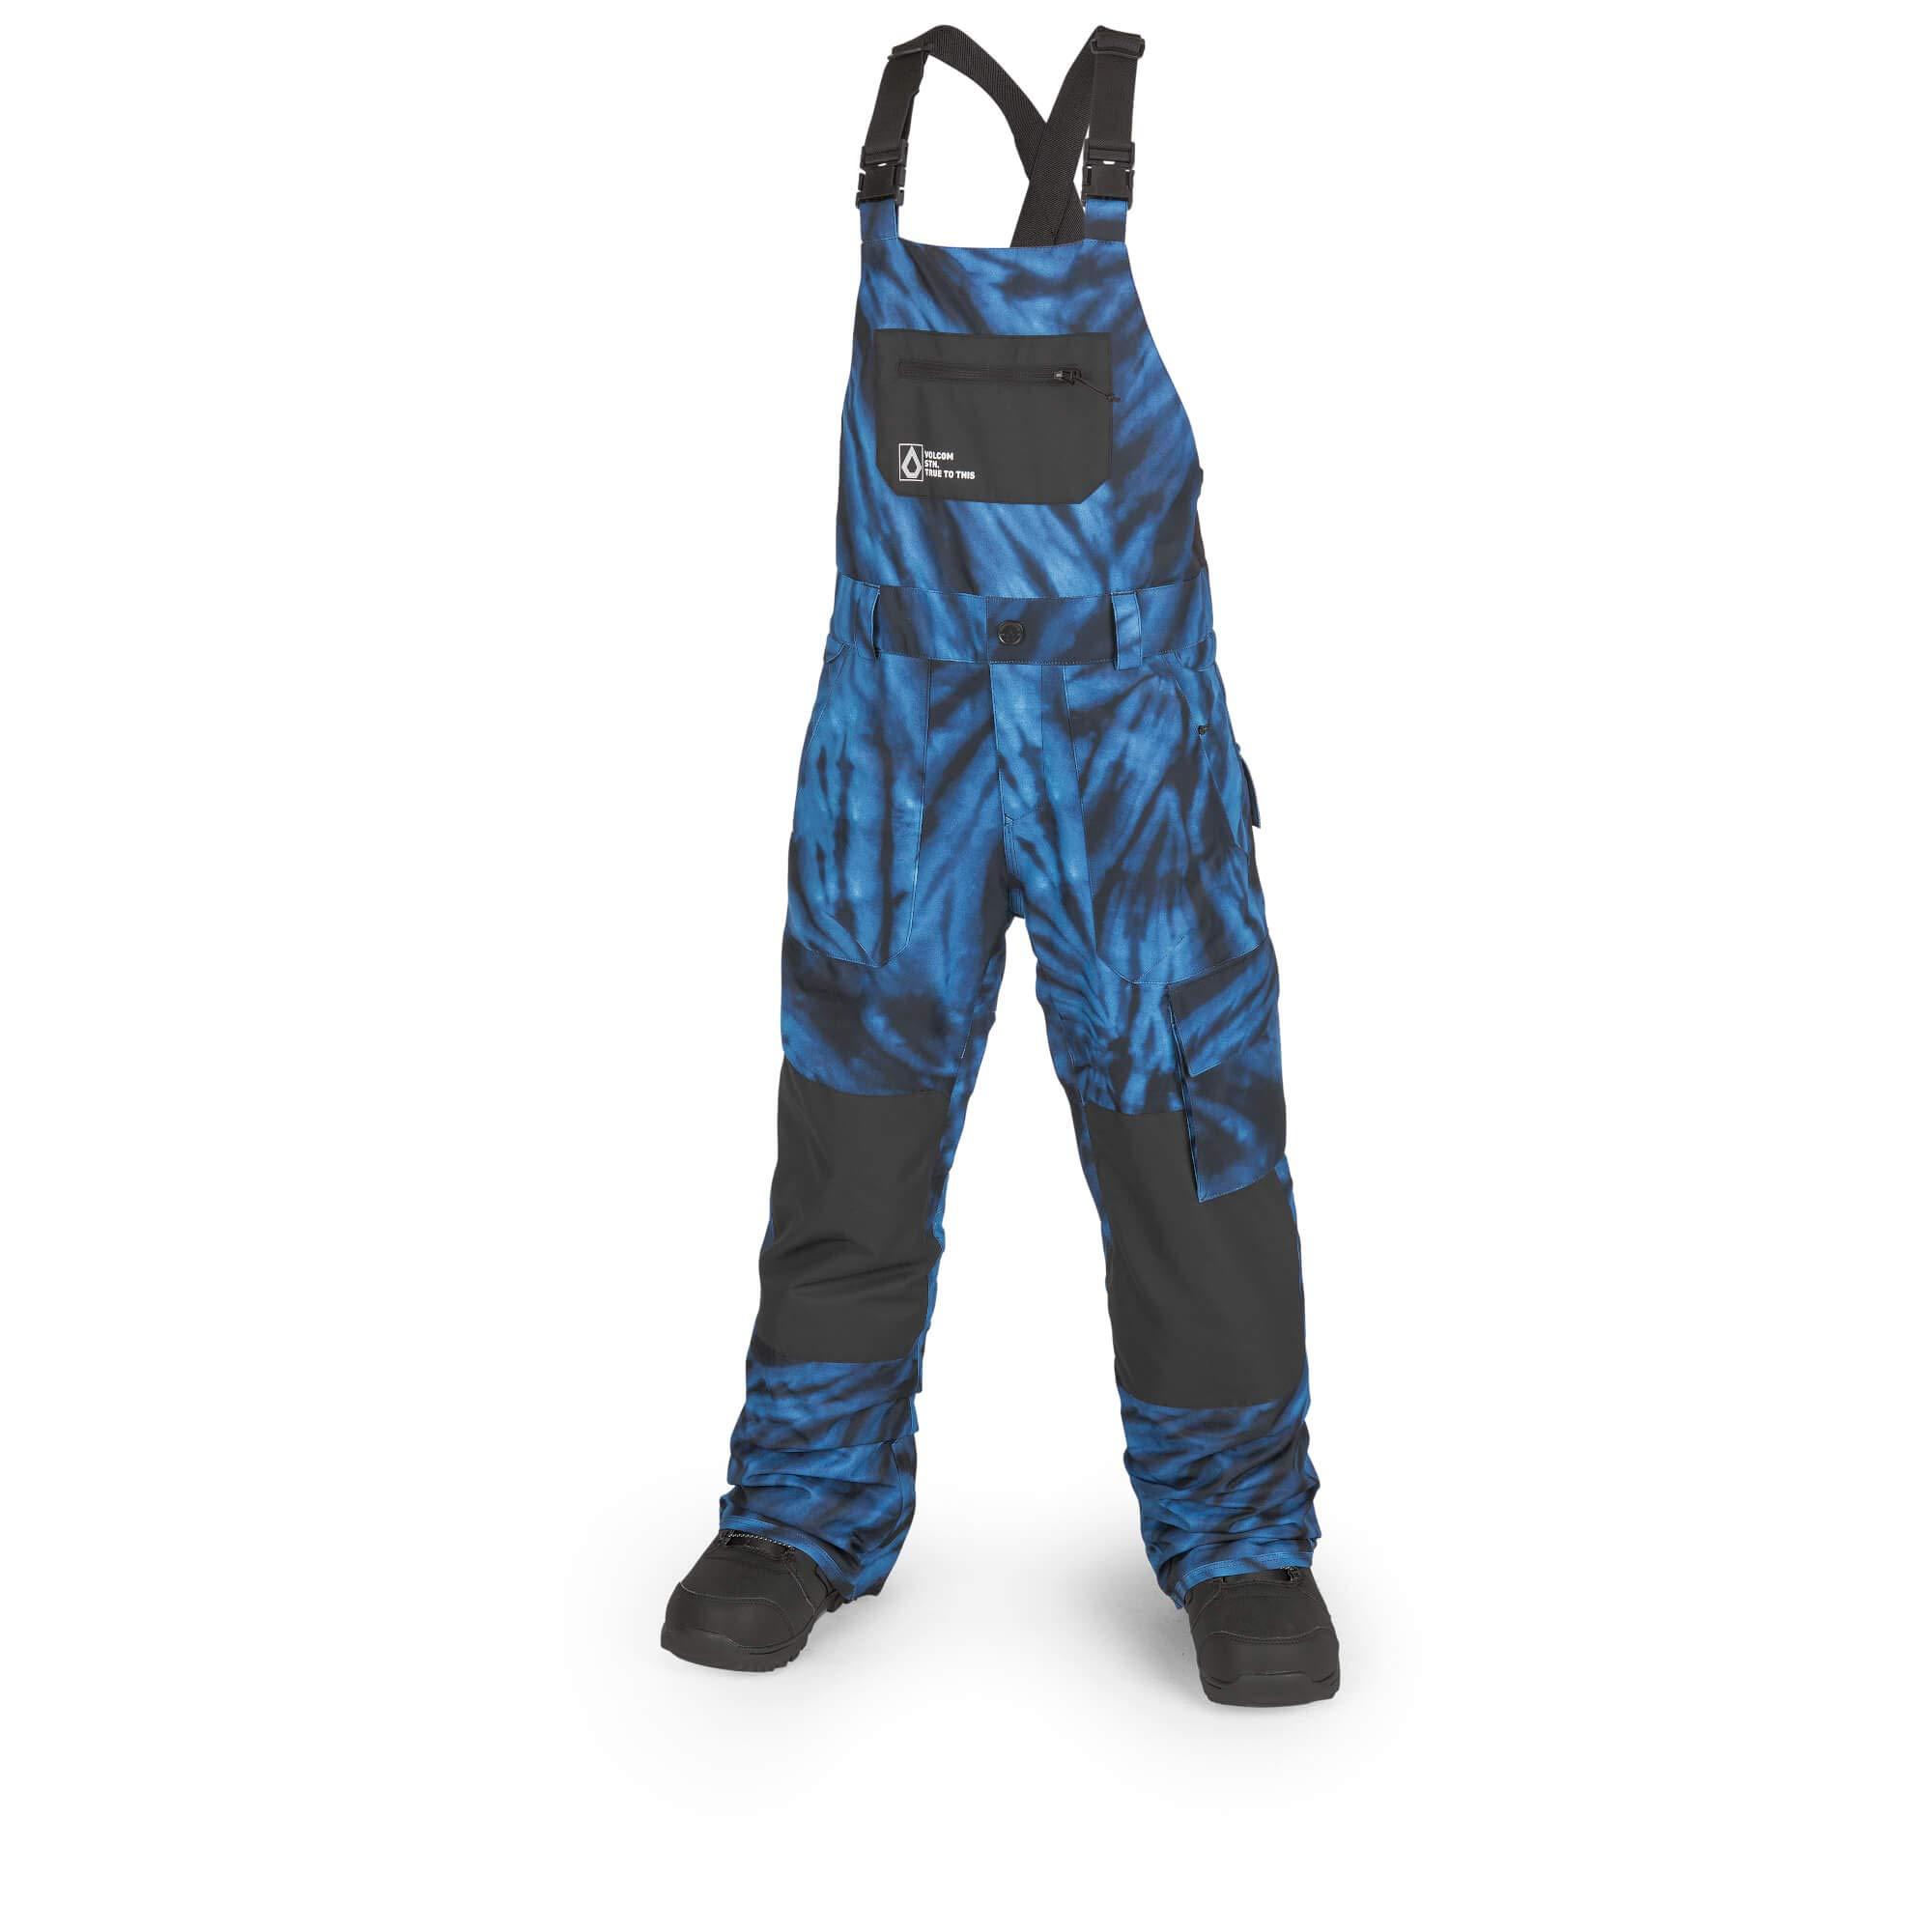 Volcom Boys Barkley 2 Layer Shell Bib Snow Overall, Blue tie/dye, Large